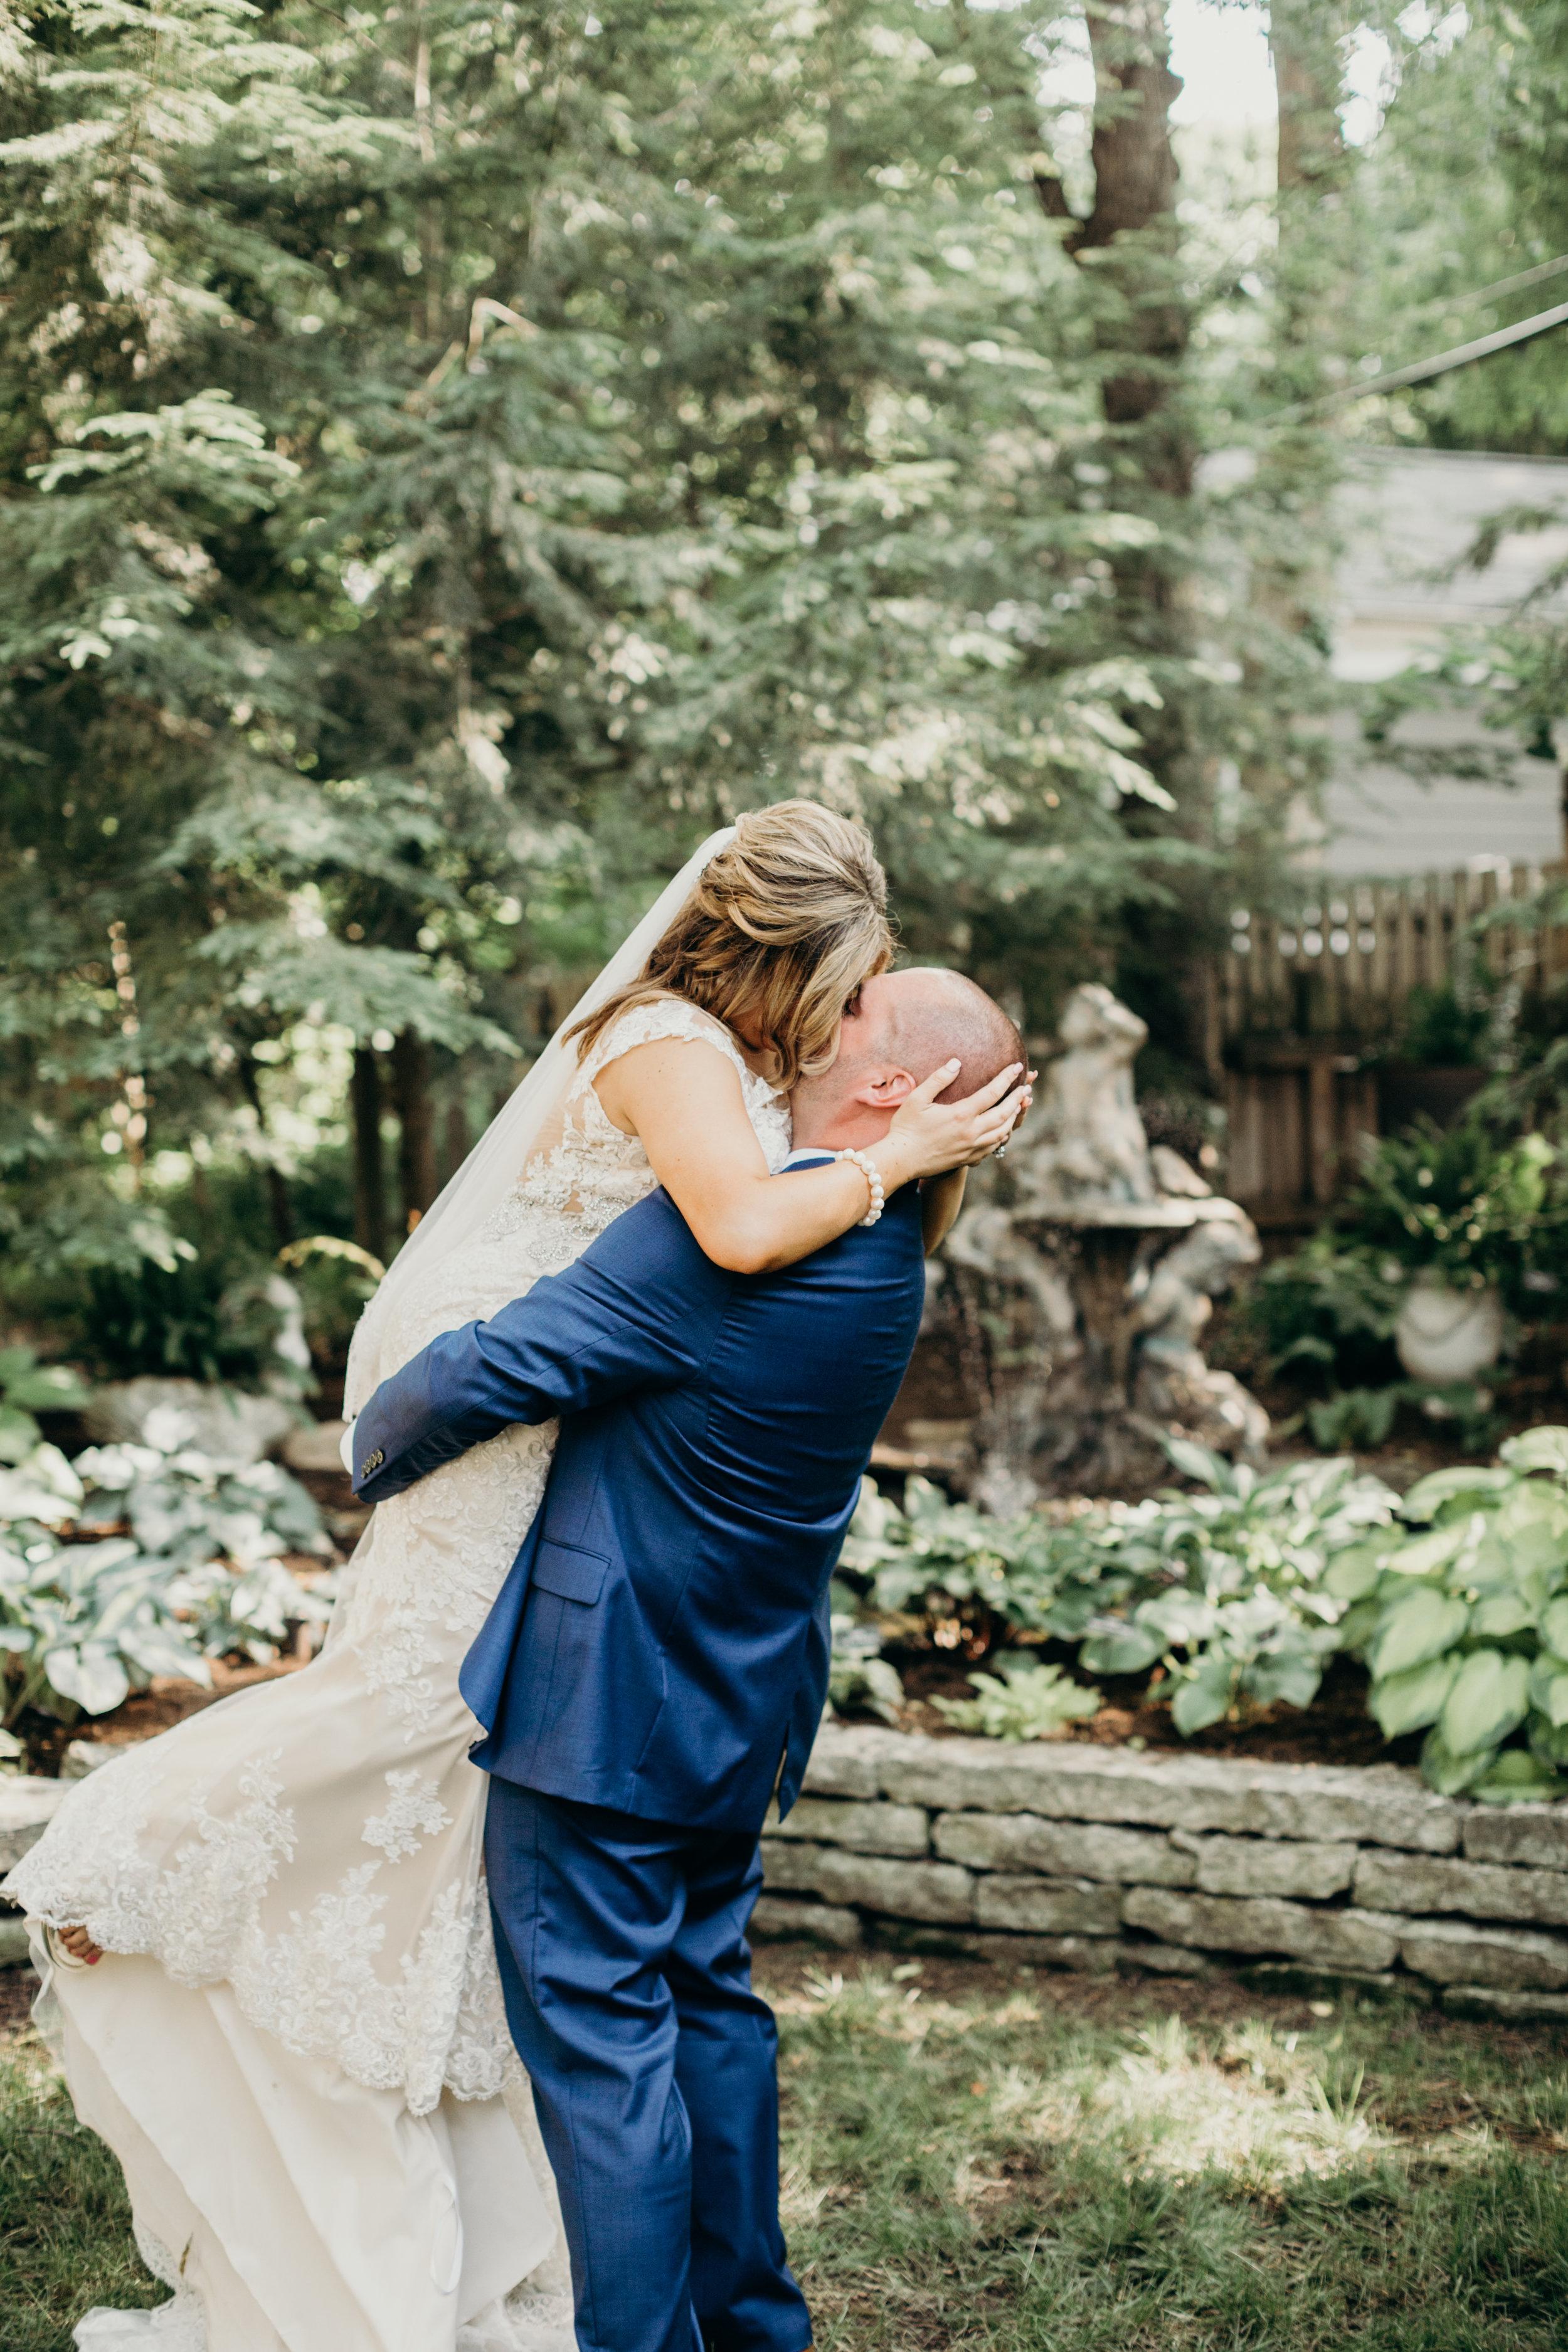 Indianpolis Intimate Wedding Photographer-19.jpg